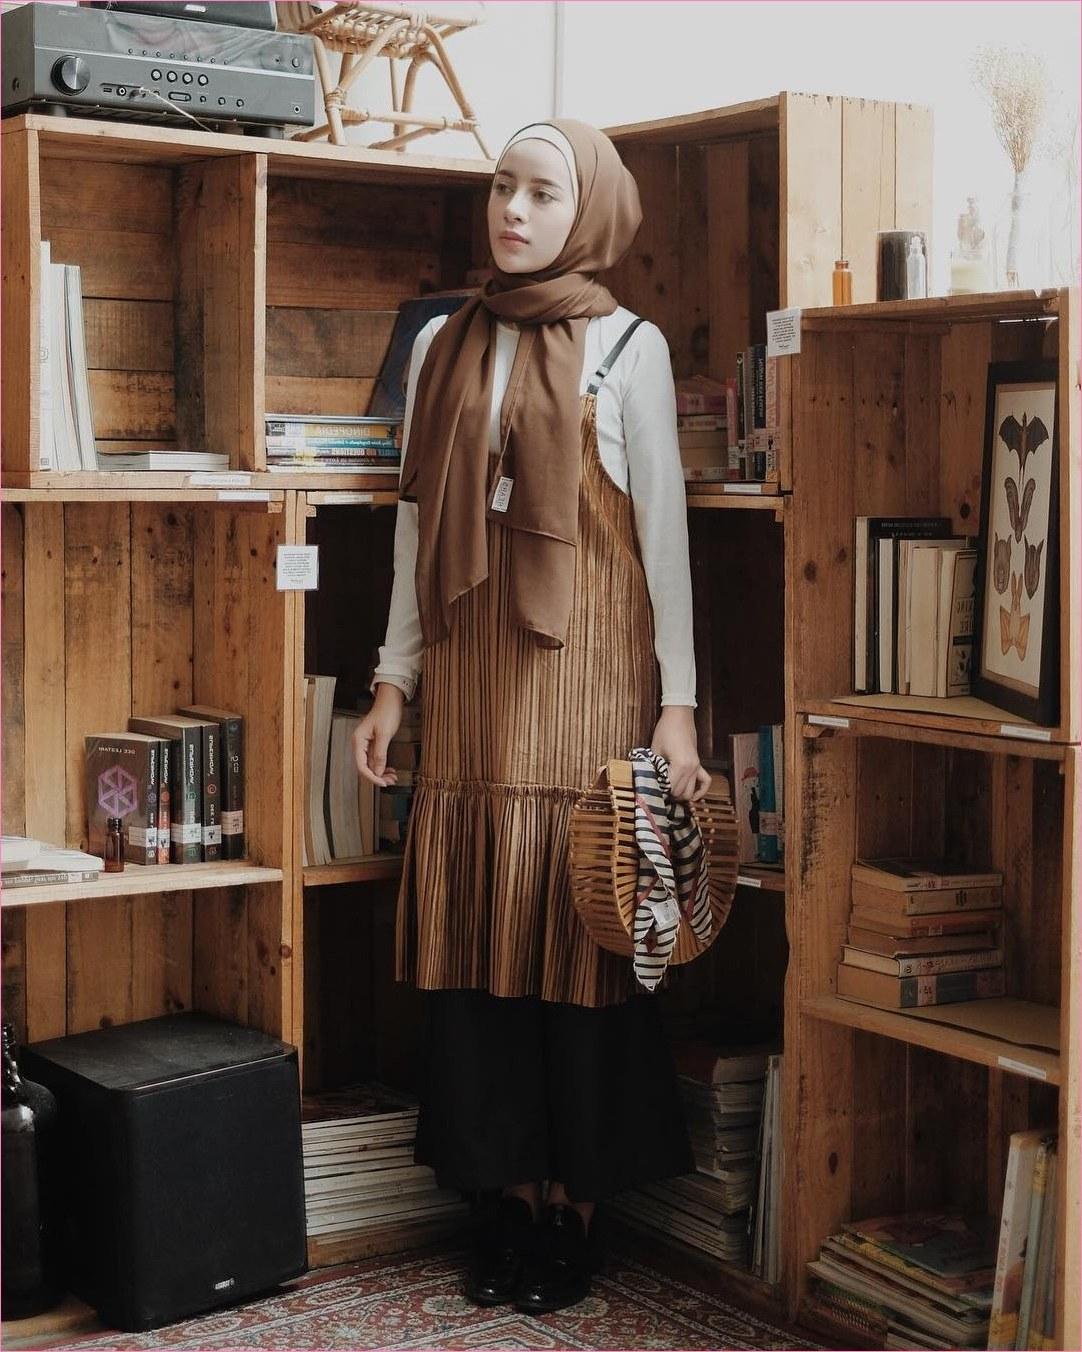 Inspirasi Baju Lebaran Wanita 2019 Whdr 80 Model Baju Lebaran Terbaru 2019 Muslimah Trendy Model